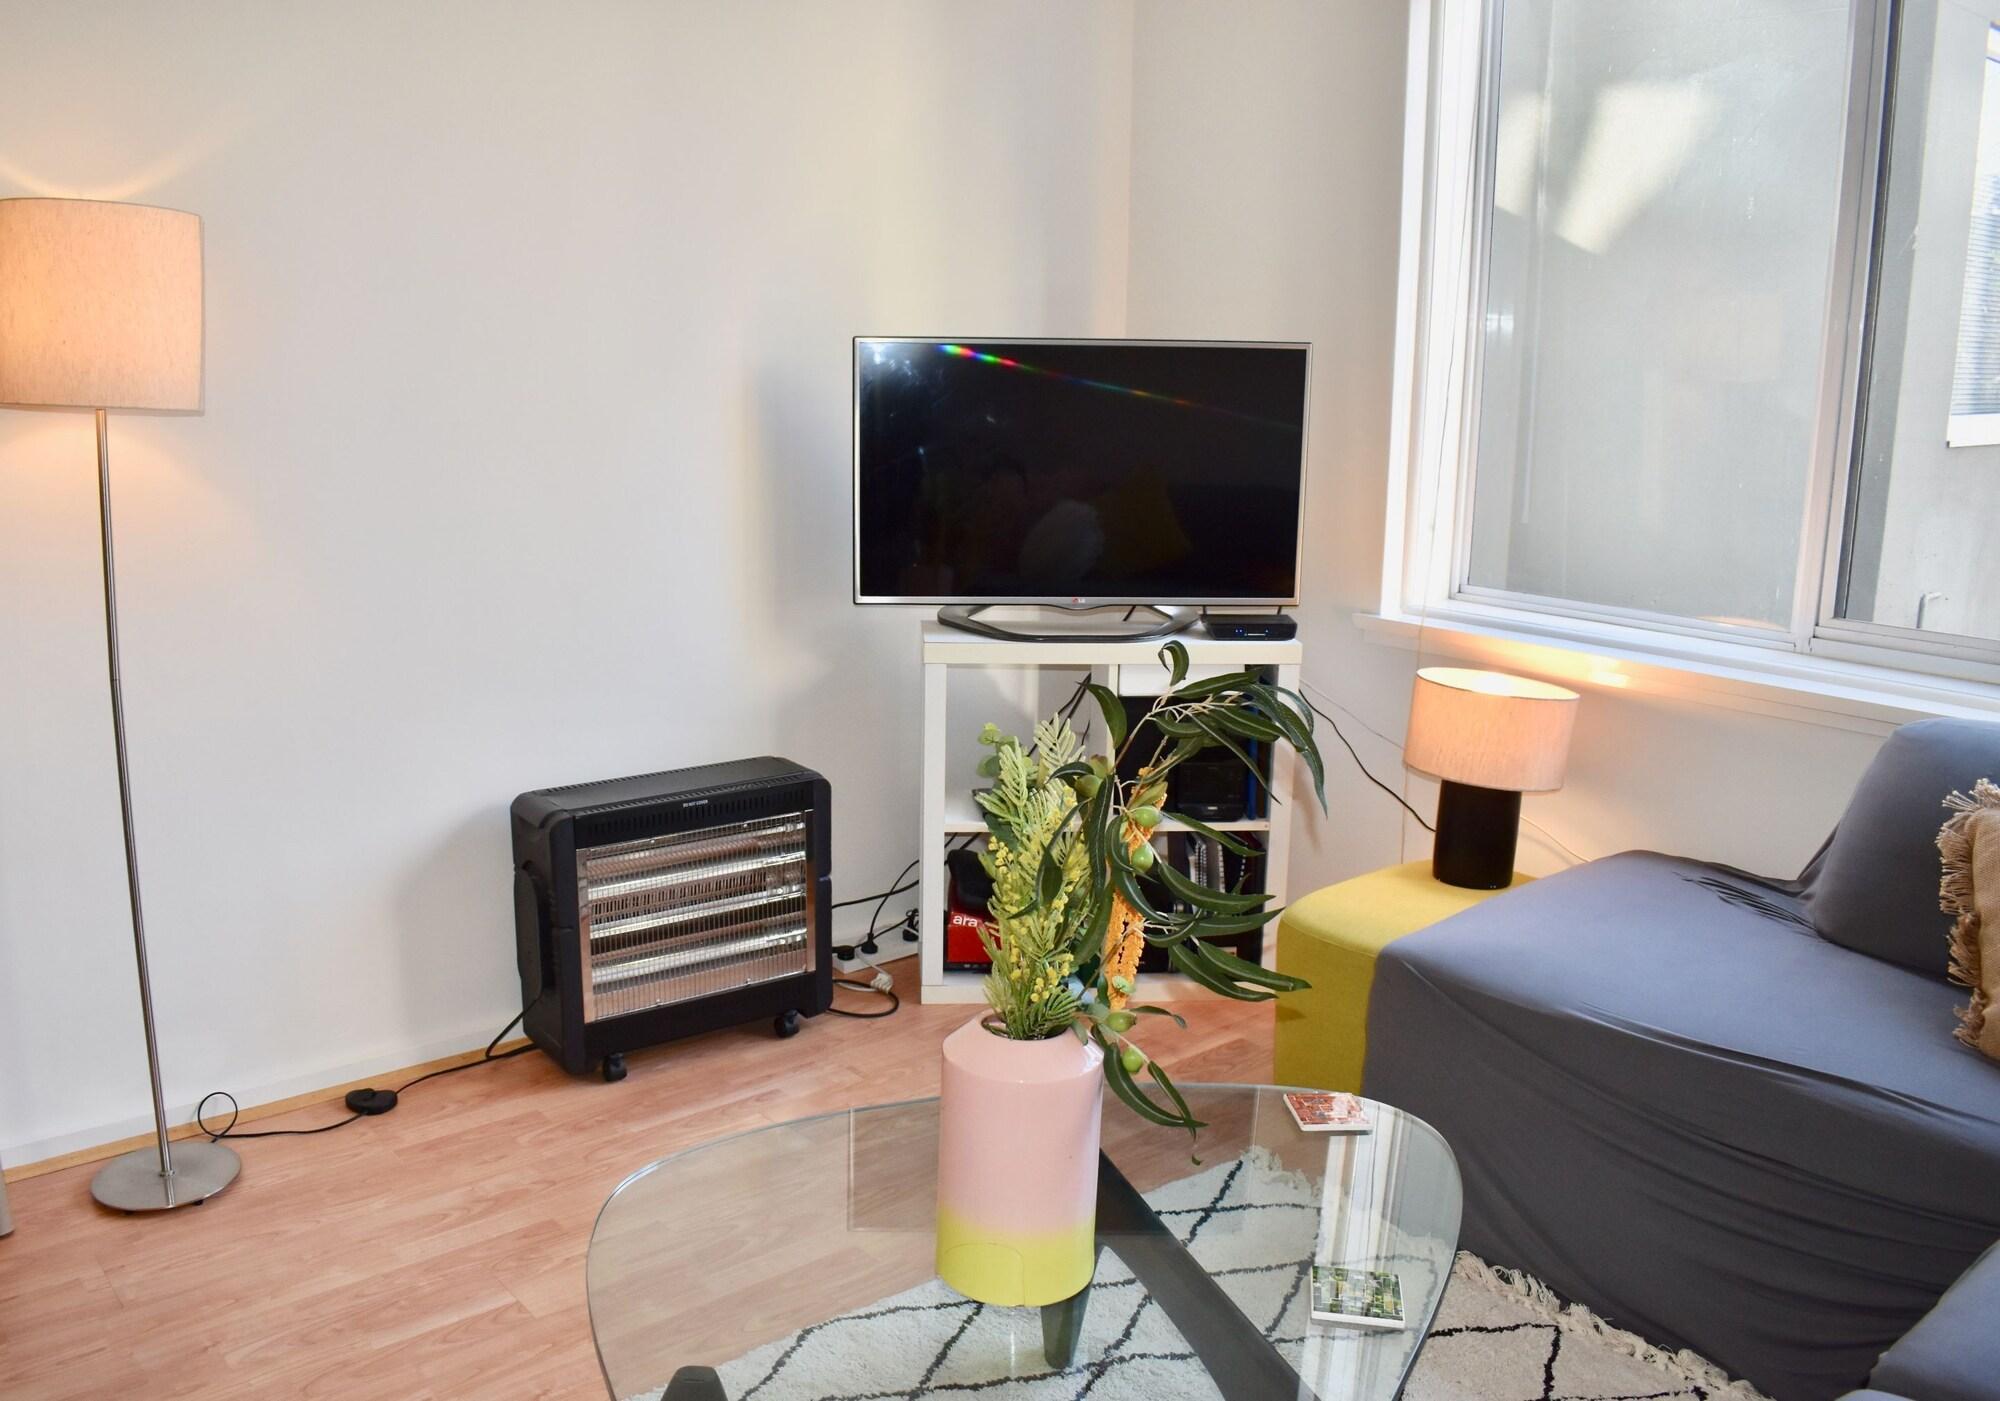 Stylish 1 Bedroom Apartment In Leafy Hawthorn, Boroondara  - Hawthorn